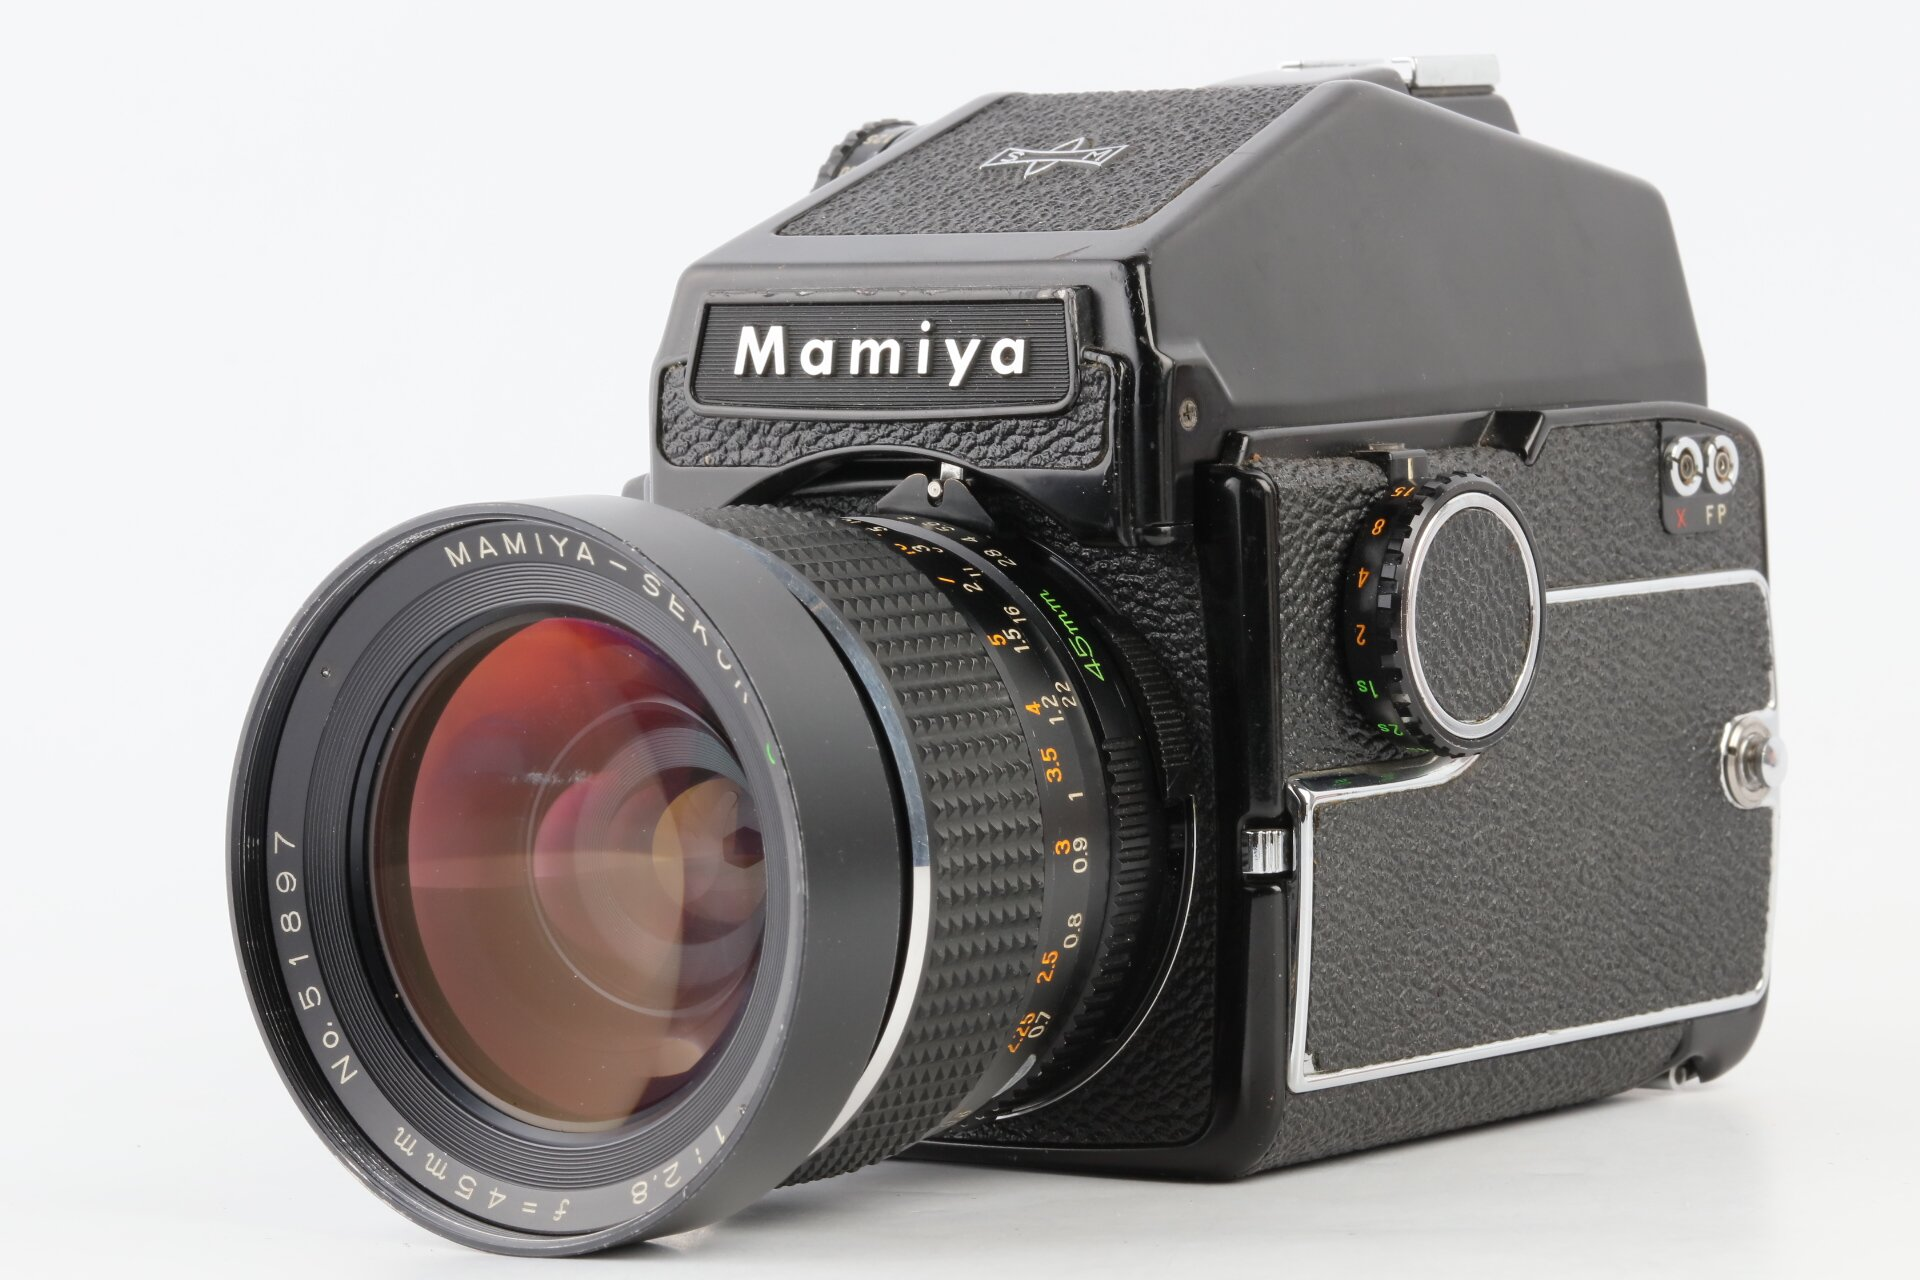 Mamiya M645 Gehäuse Mamiya-Sekor C 2,8/45mm Objektiv